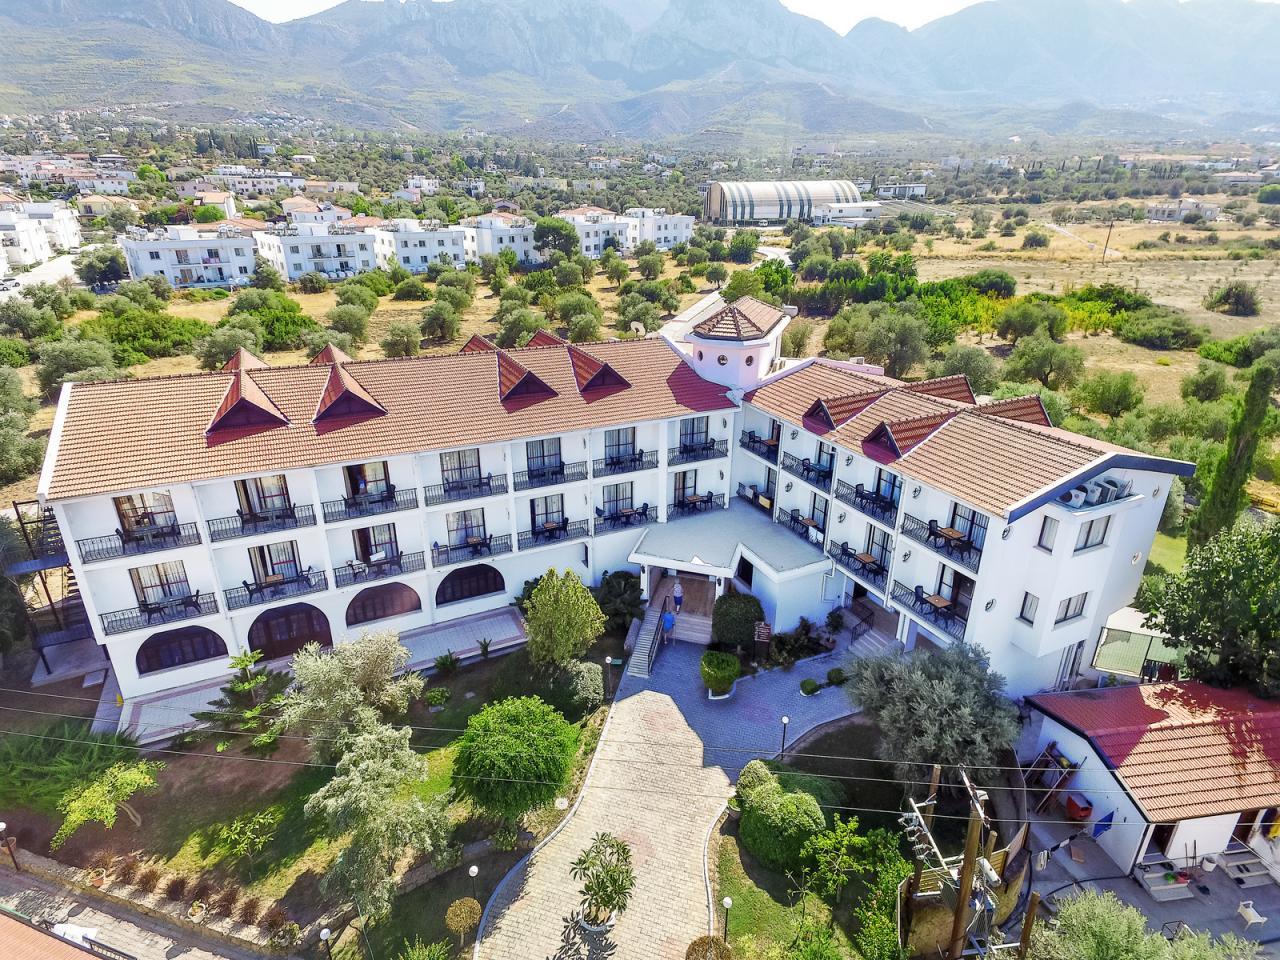 The Ship Inn Hotel And Villas